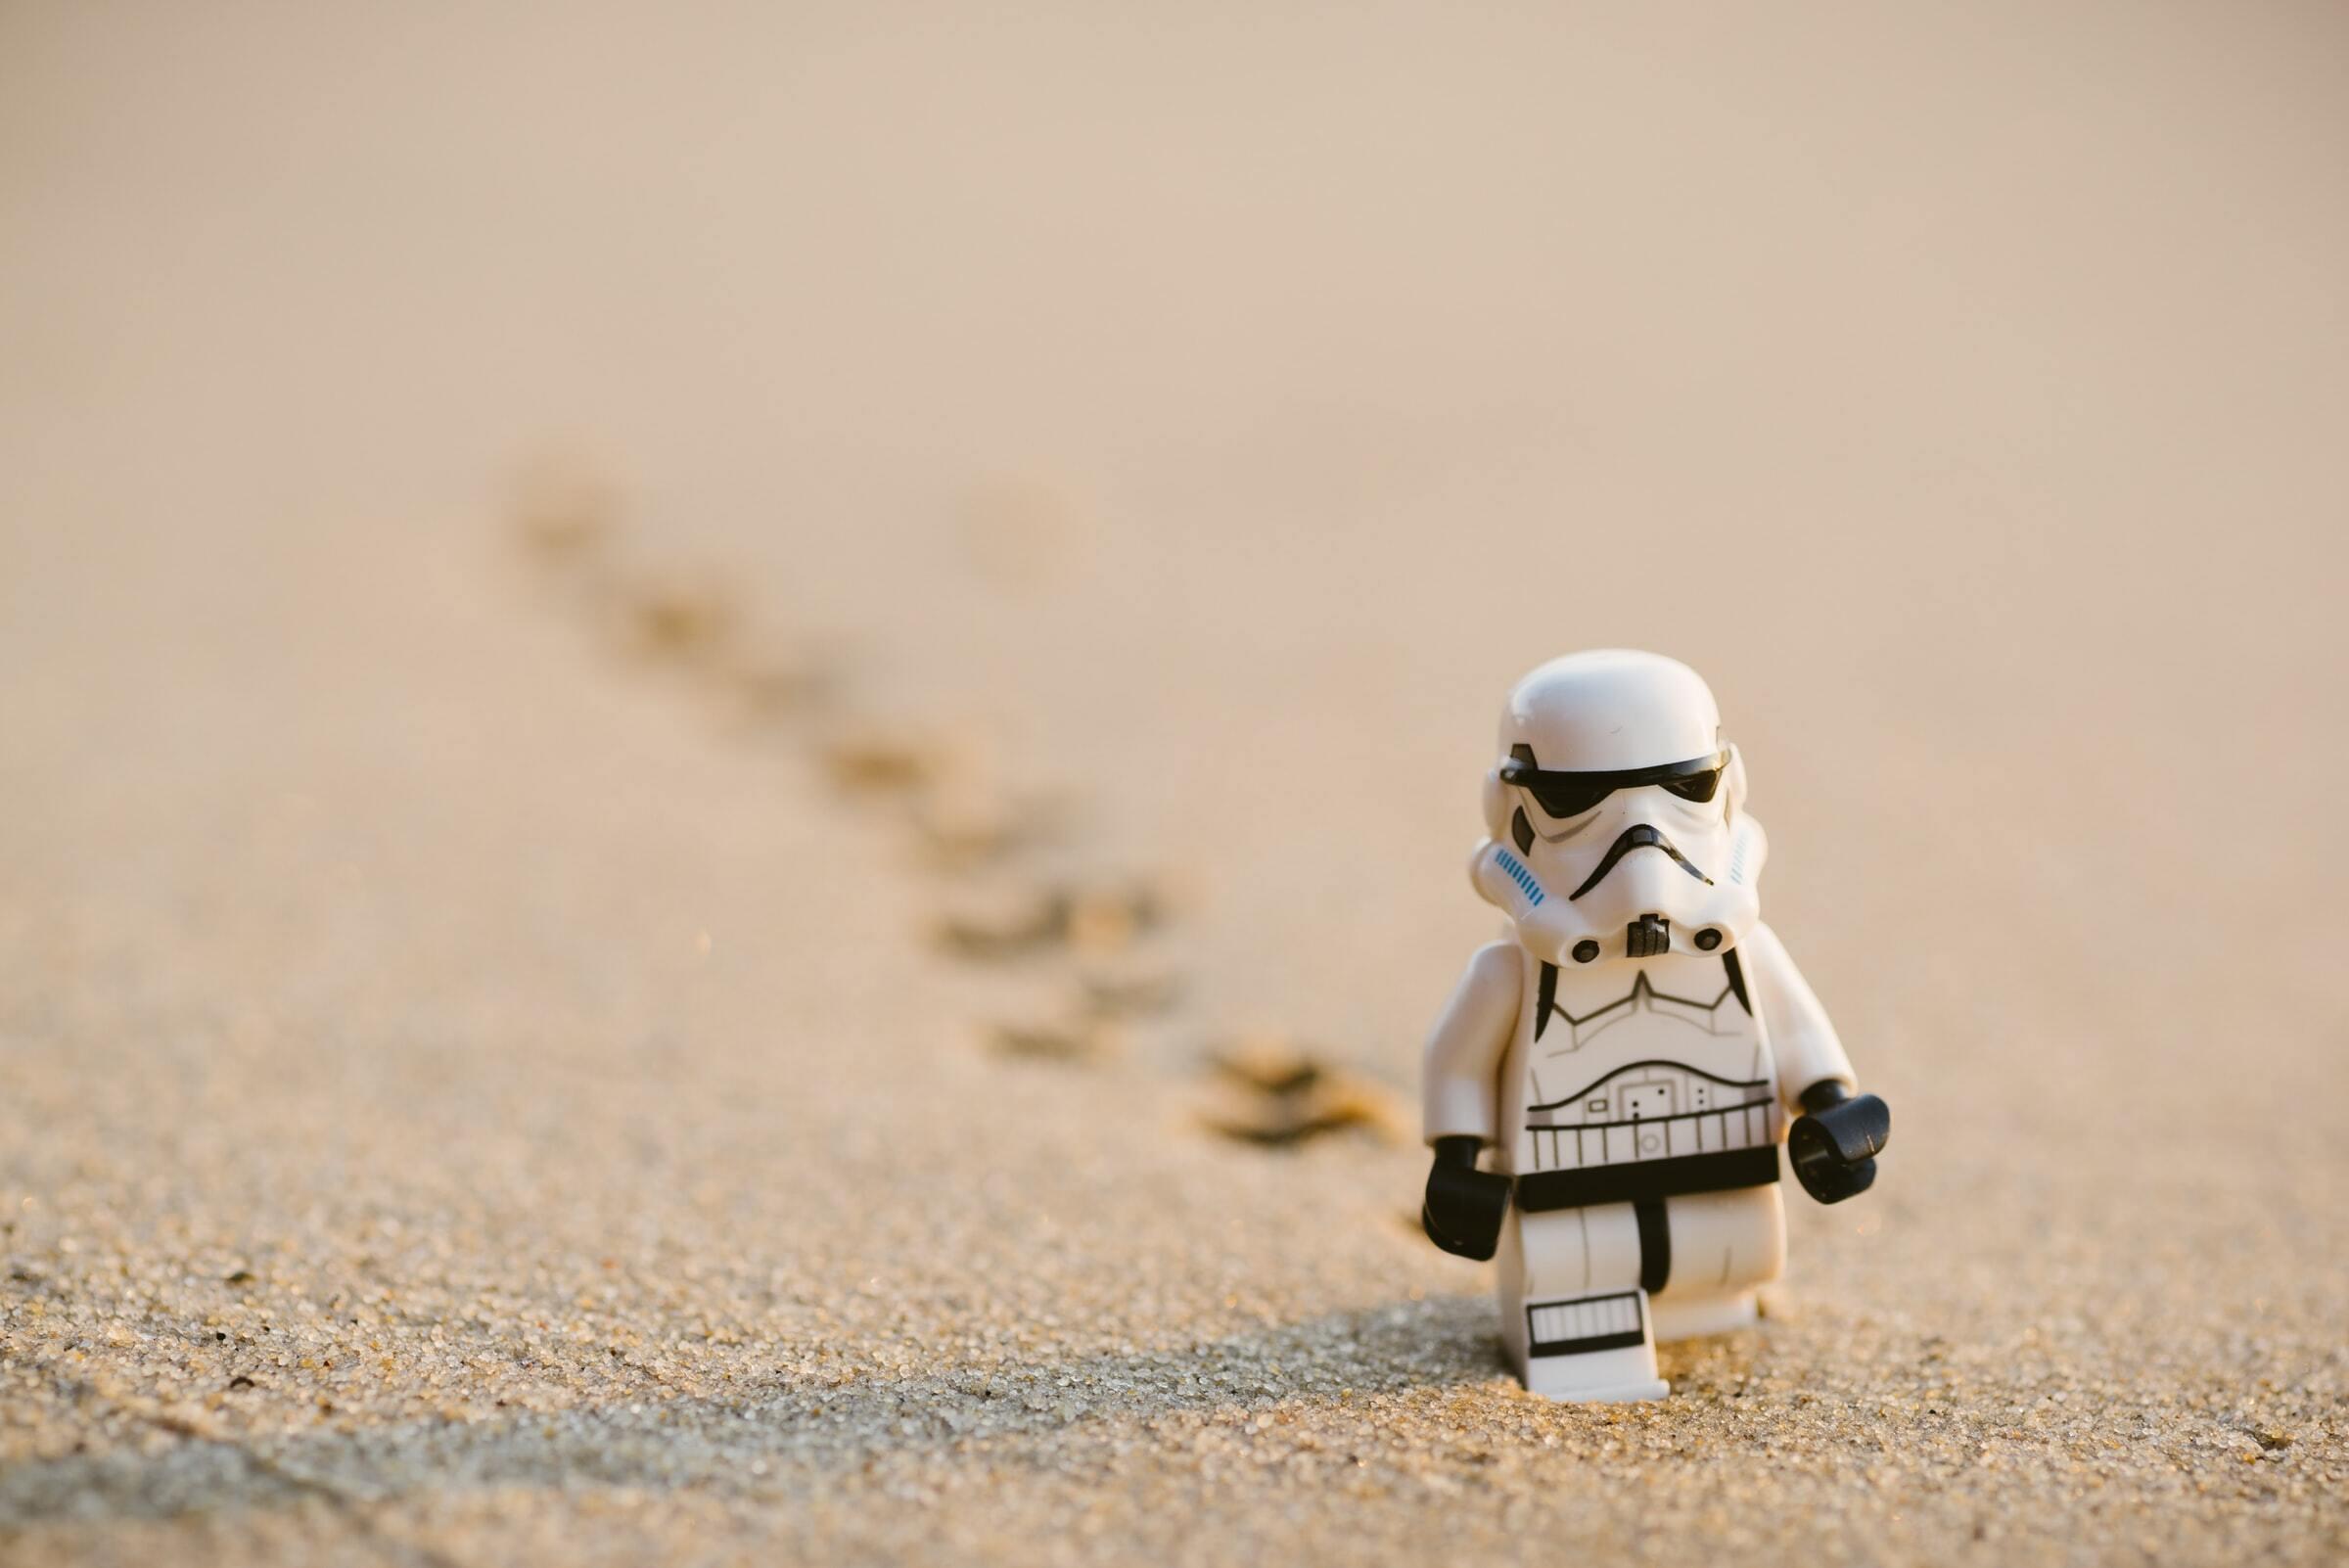 How does Lego crowdsourcing work? @GoldenNinja3000 talks us through his Ninjago success story